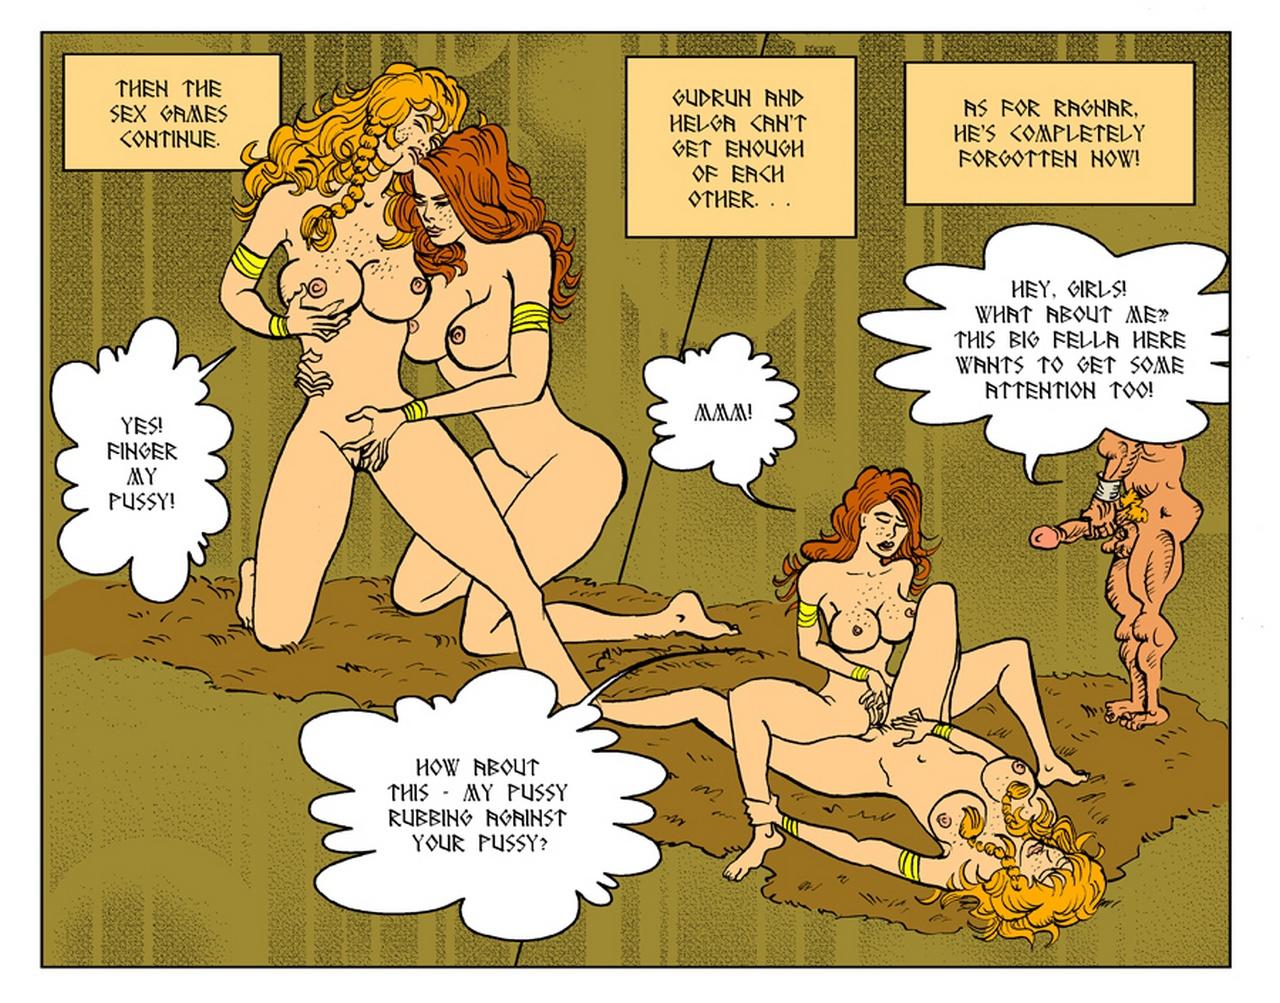 Horny Saga 1 - part 2